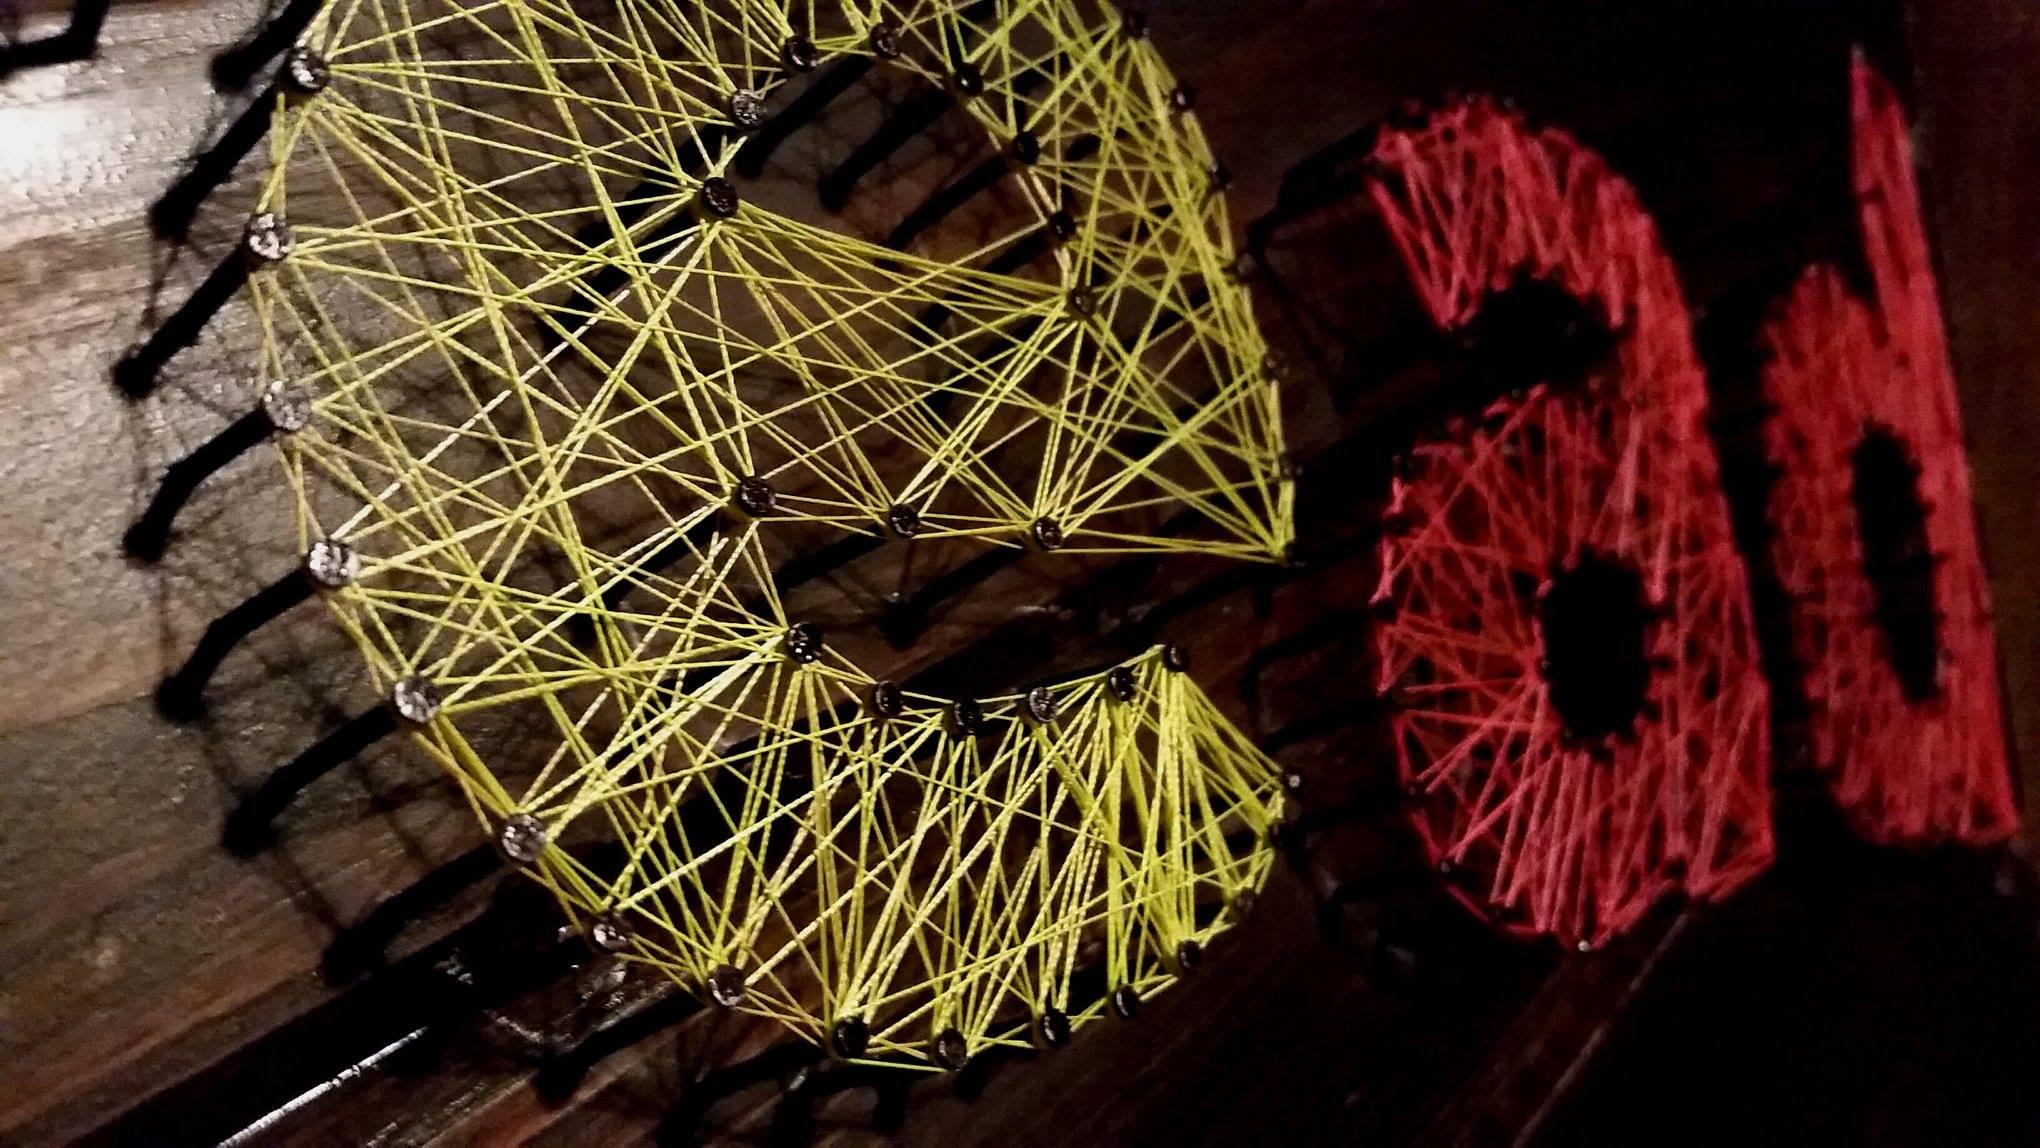 Gildan Clothing Co. string art